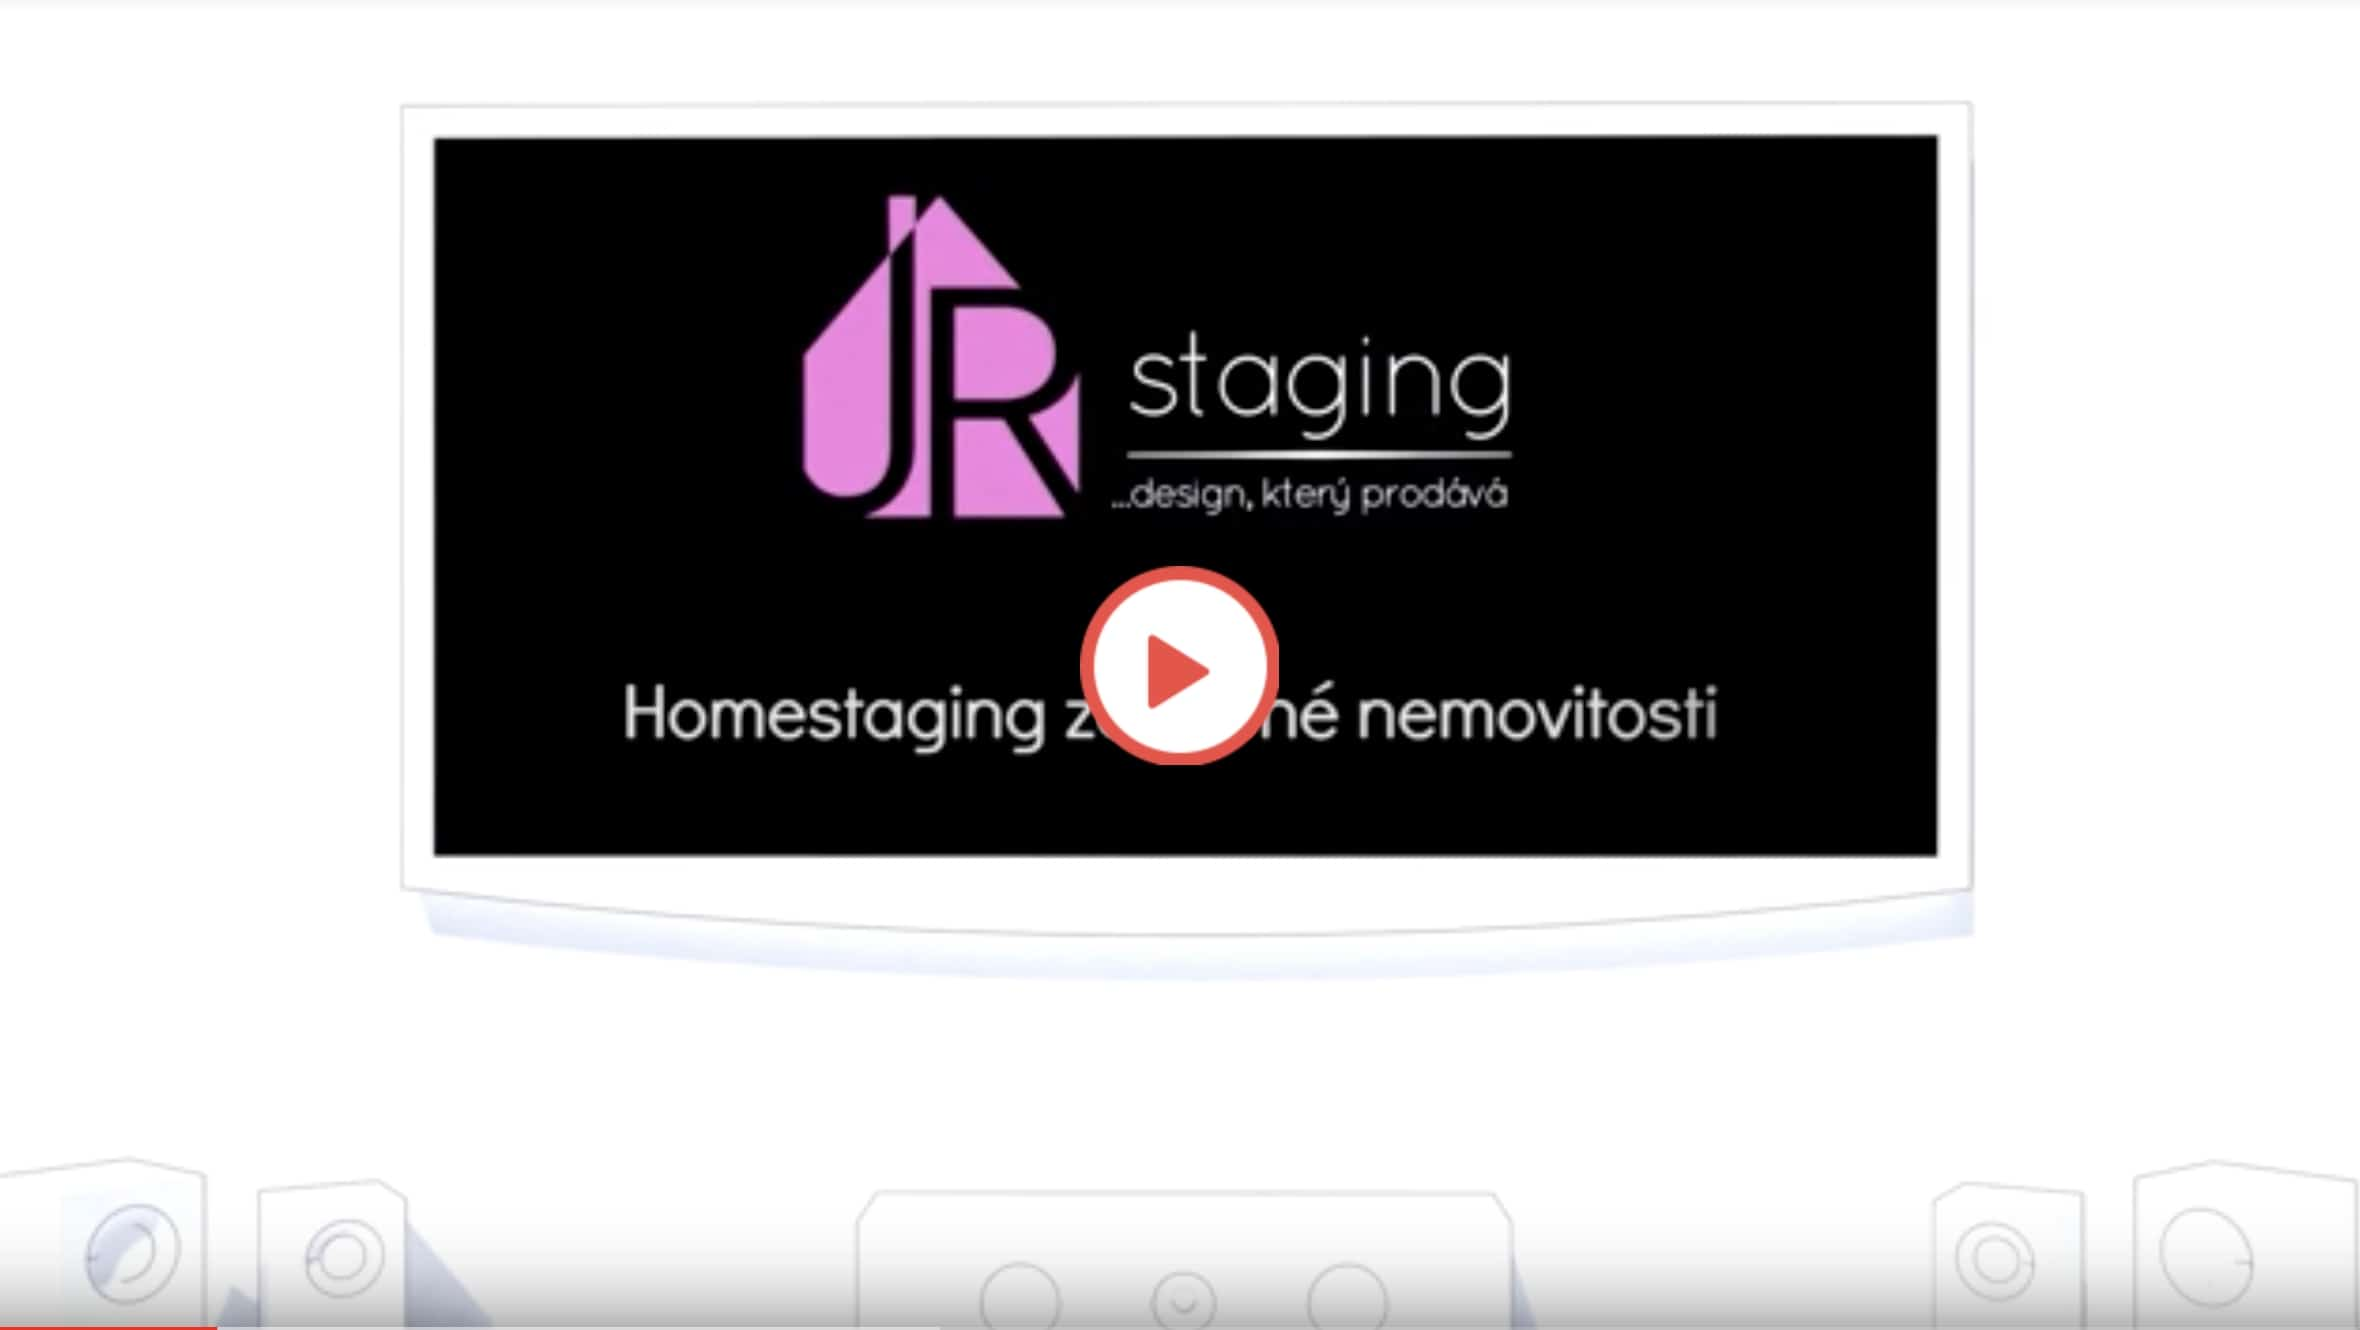 homestaging 2